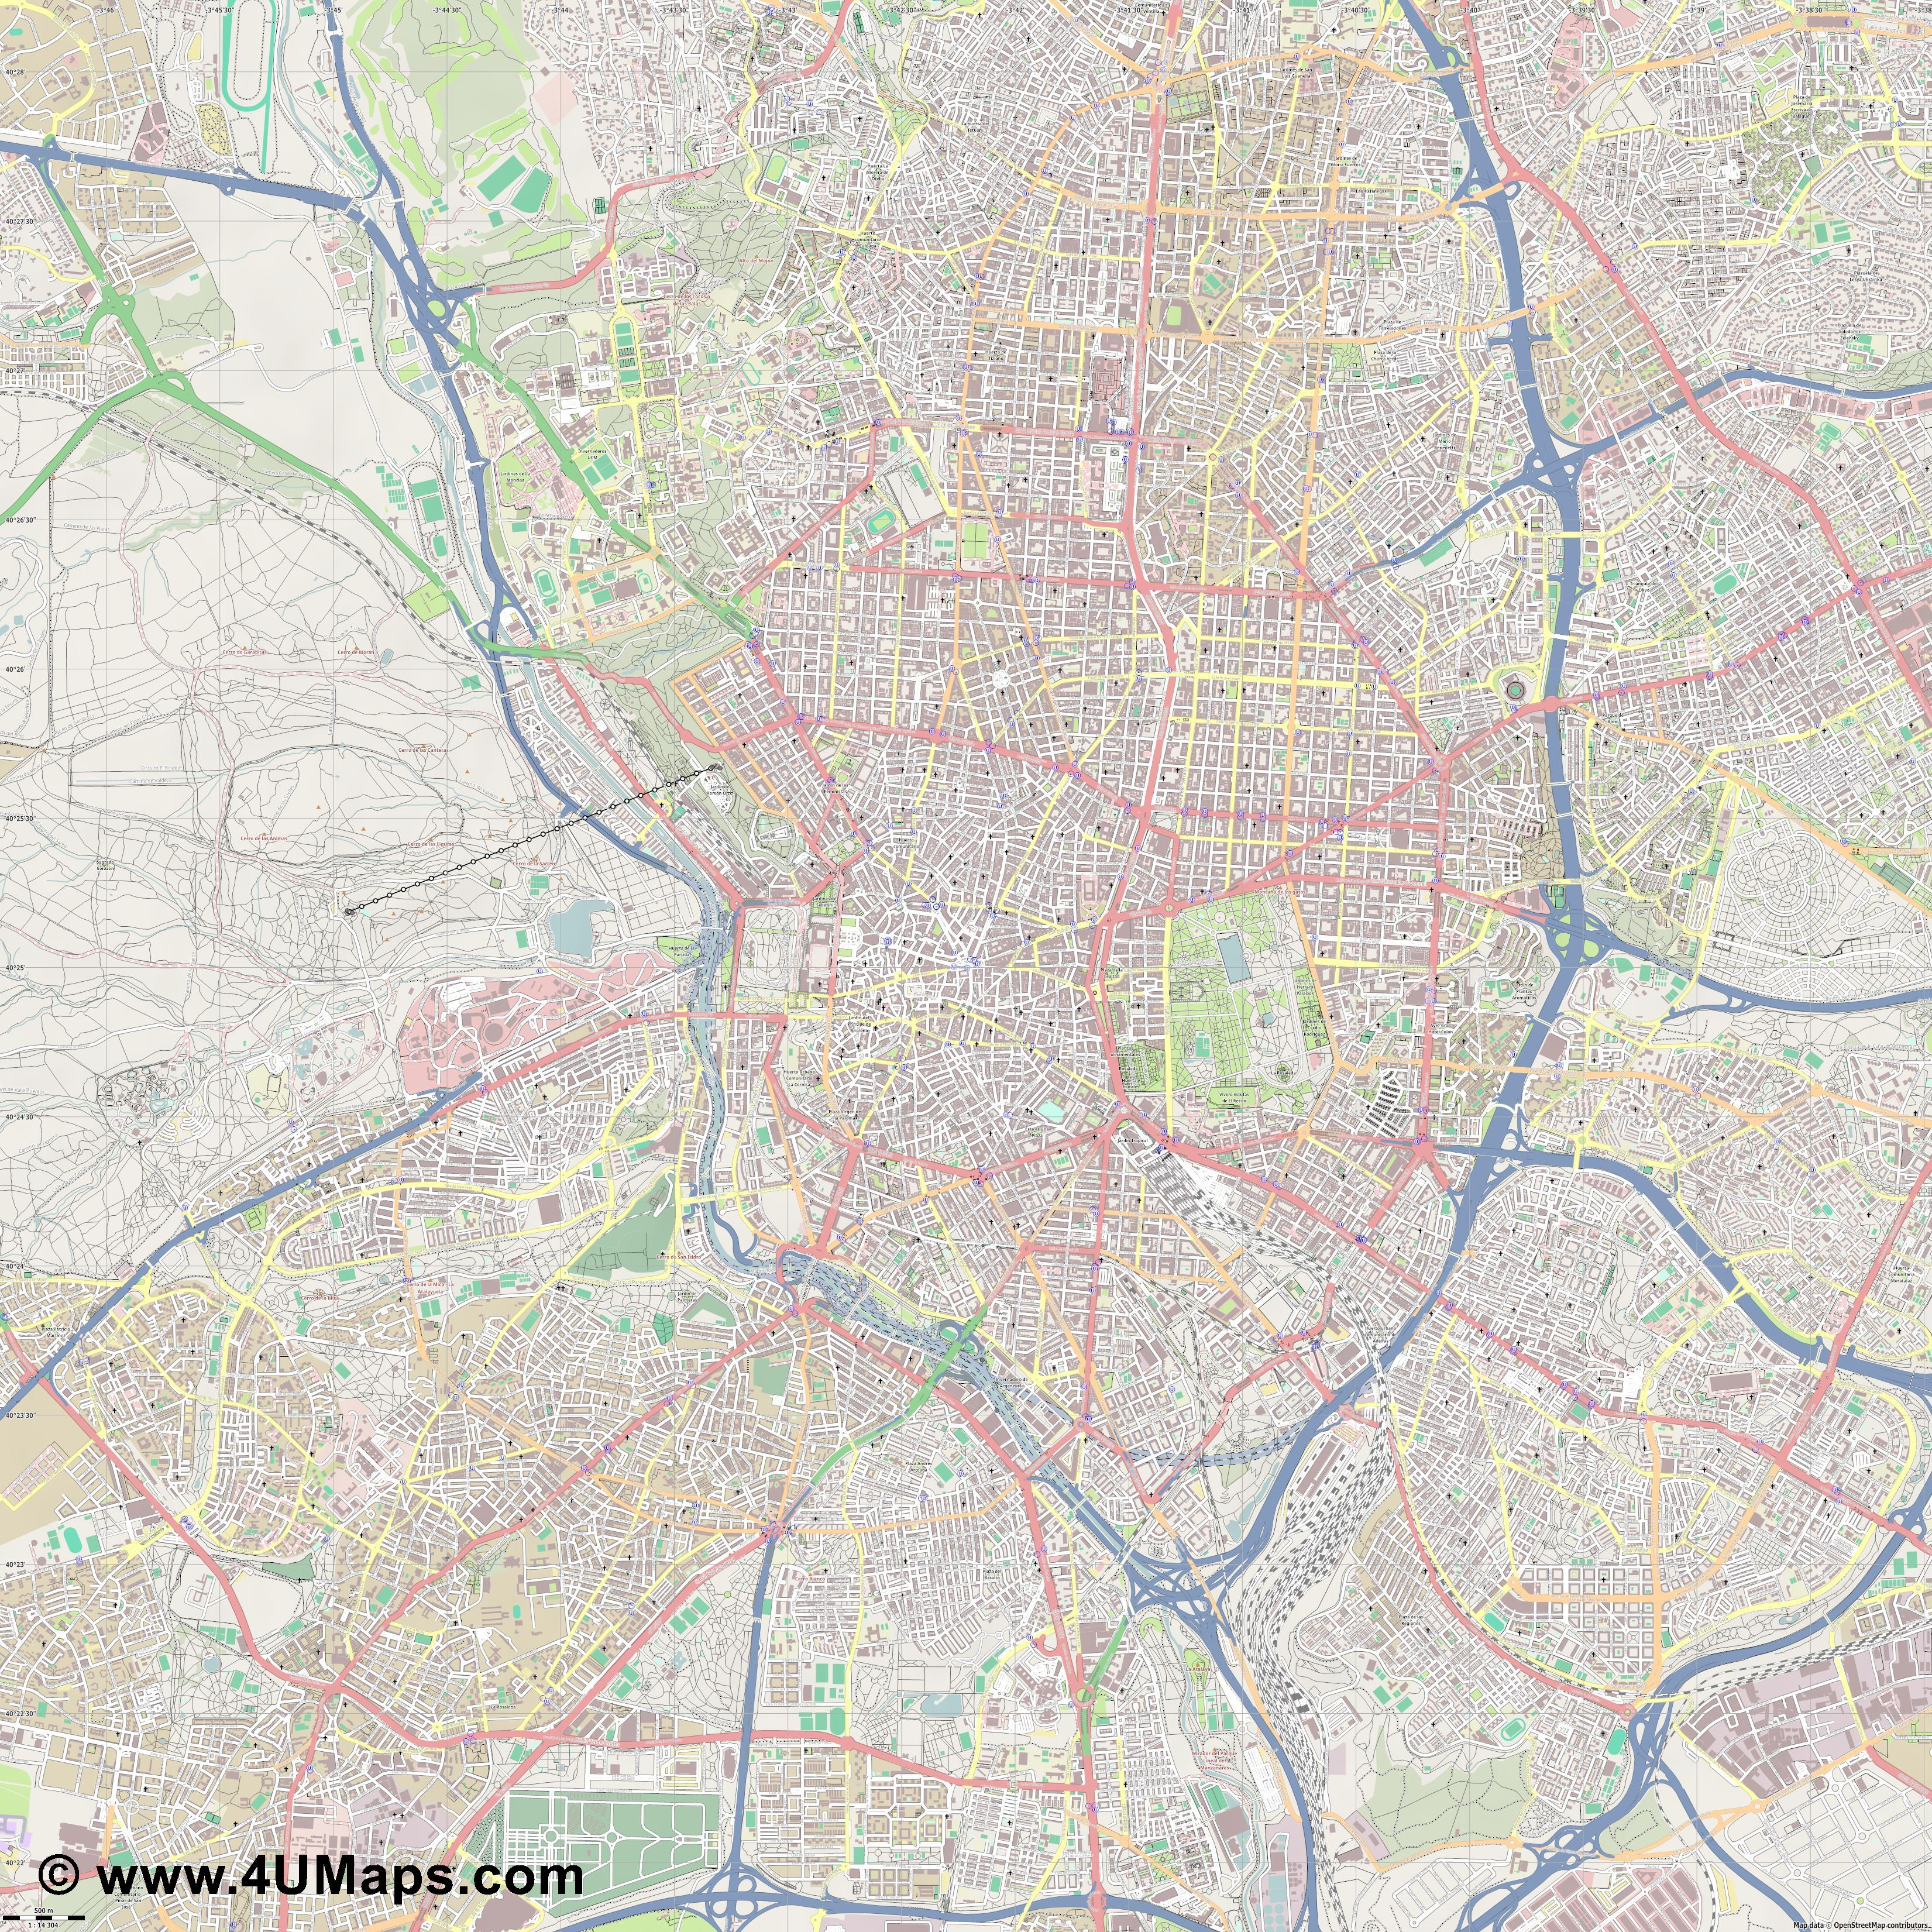 PDF, Svg Scalable Vector City Map Madrid Madrid City Map Pdf on hong kong mtr map pdf, positano map pdf, lisbon map pdf, kyoto map pdf, frankfurt map pdf, vatican city map pdf, gibraltar map pdf, montreal map pdf, rome map pdf, dubai map pdf, havana map pdf, budapest map pdf, cancun hotel map pdf, bangkok map pdf, livorno map pdf, tokyo map pdf, paris map pdf, barcelona map pdf, san francisco map pdf, helsinki map pdf,